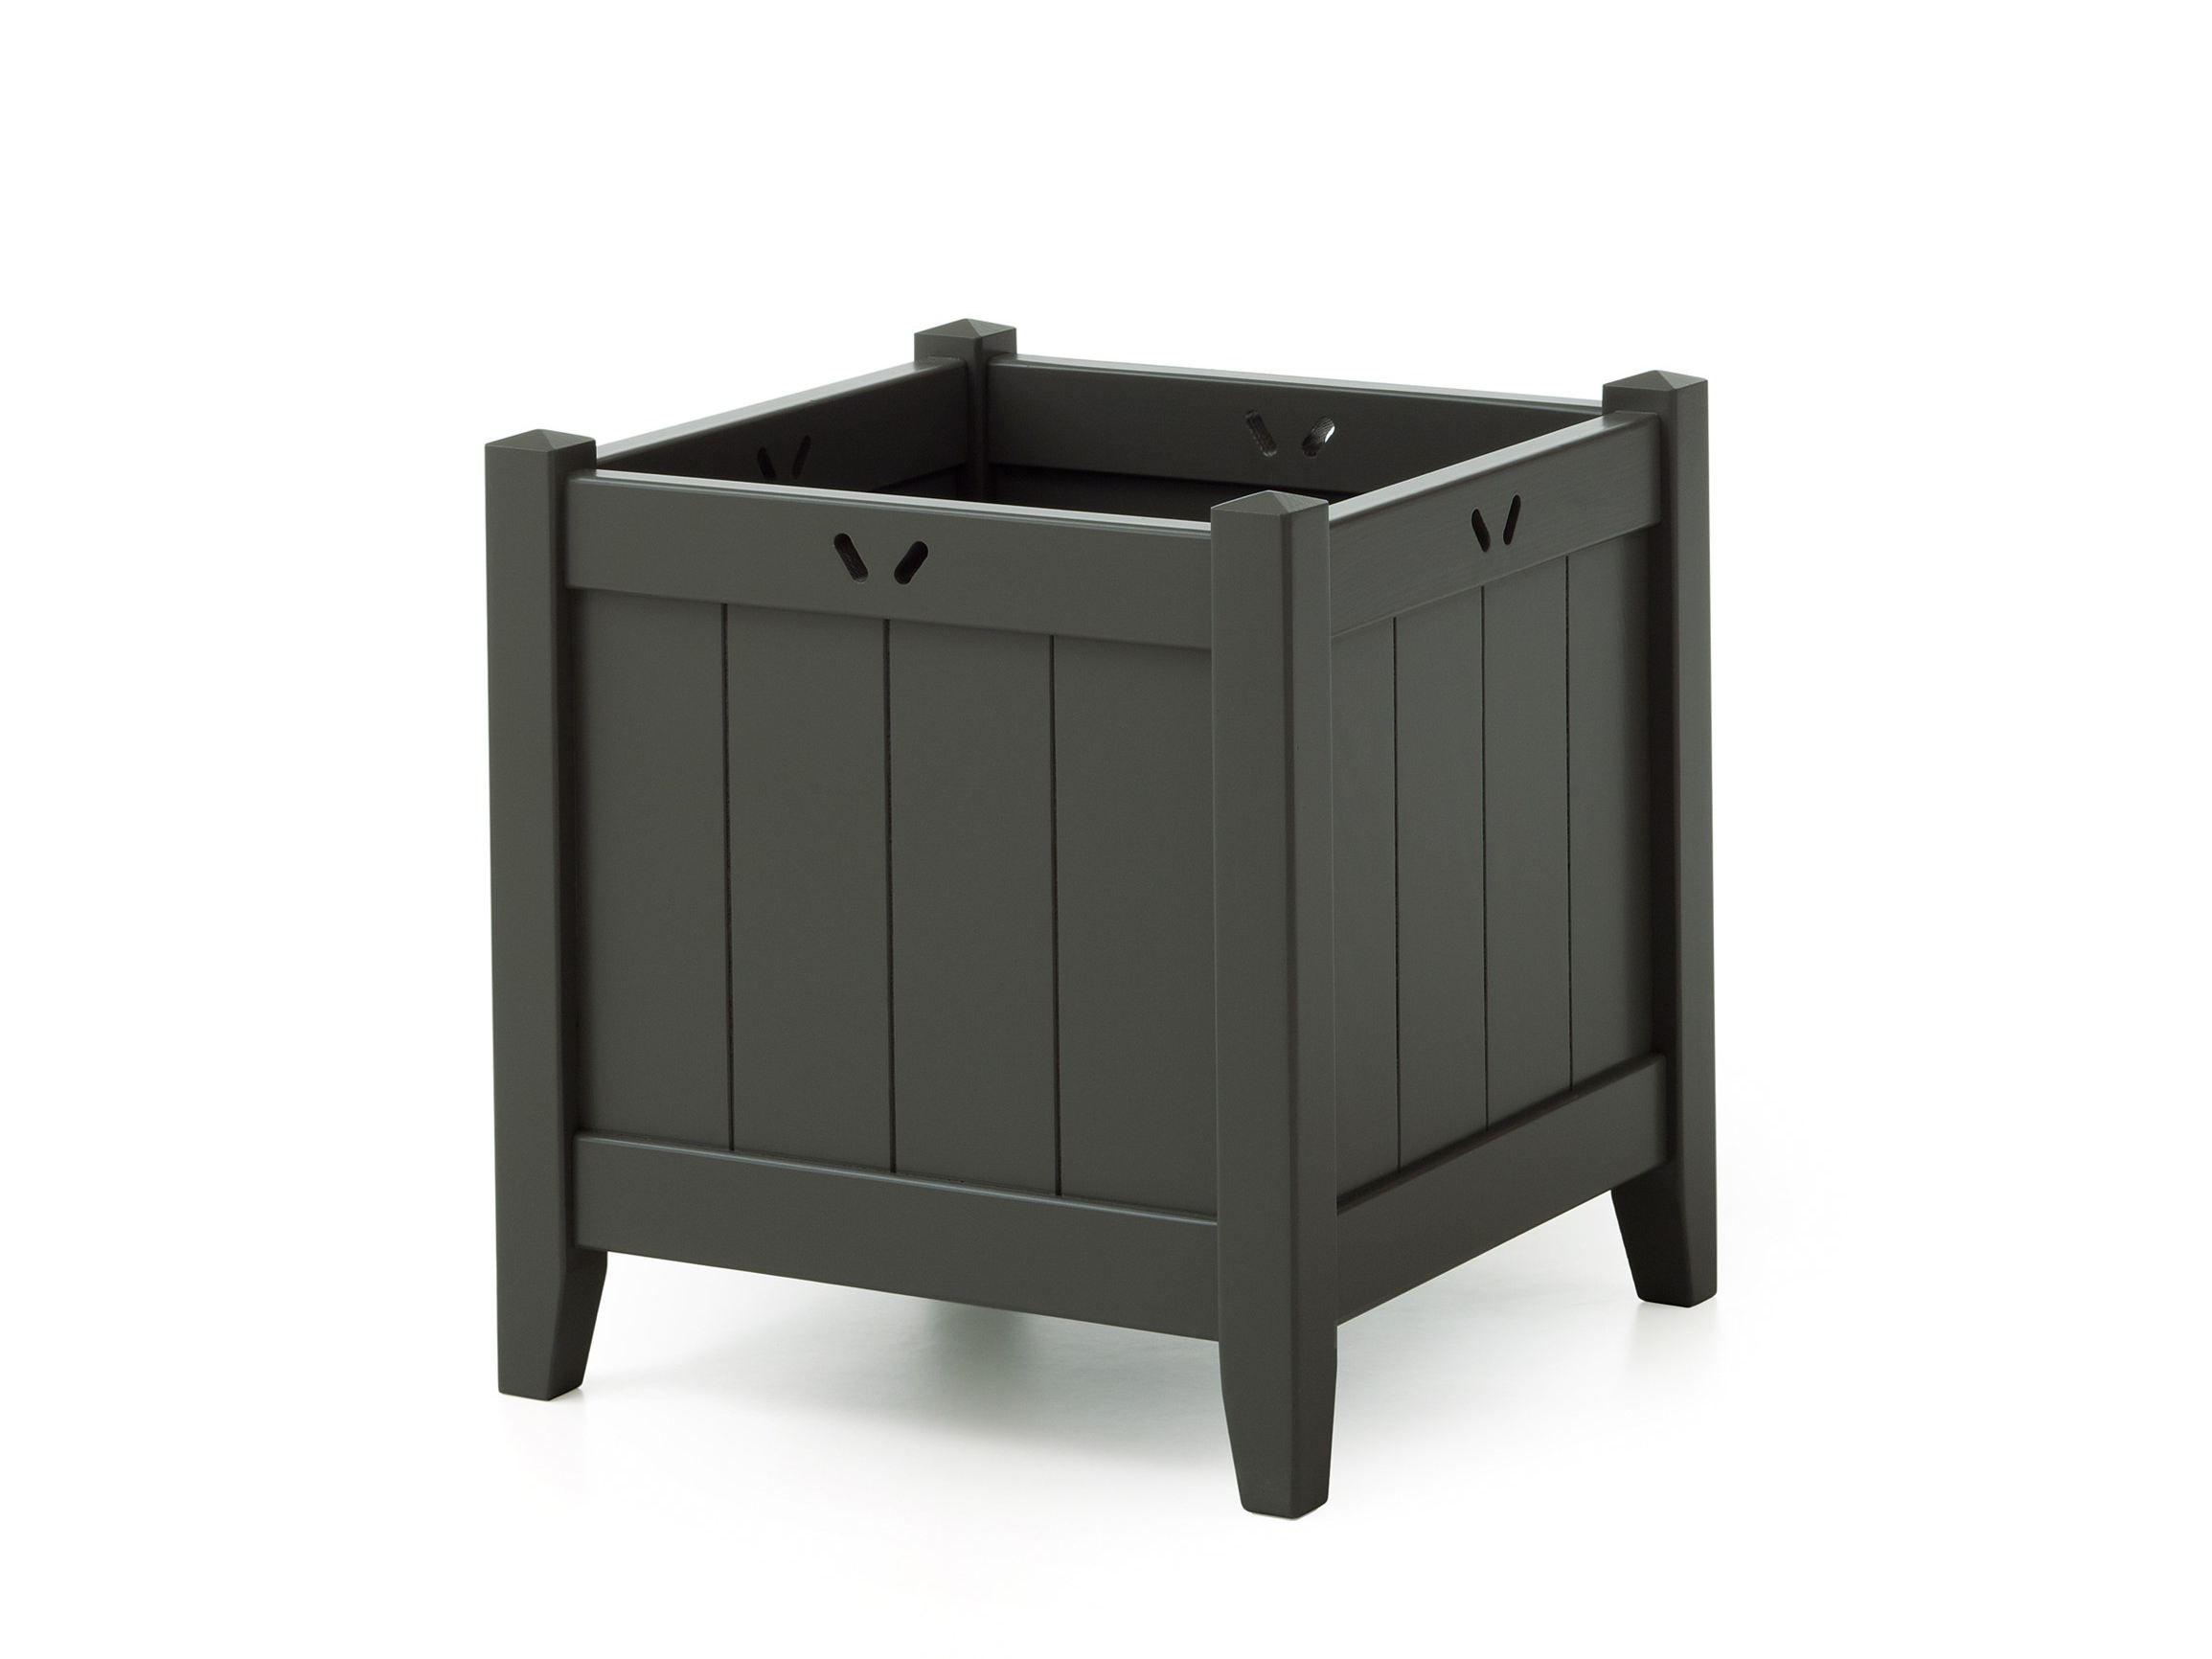 english mood w schesammler by minacciolo. Black Bedroom Furniture Sets. Home Design Ideas